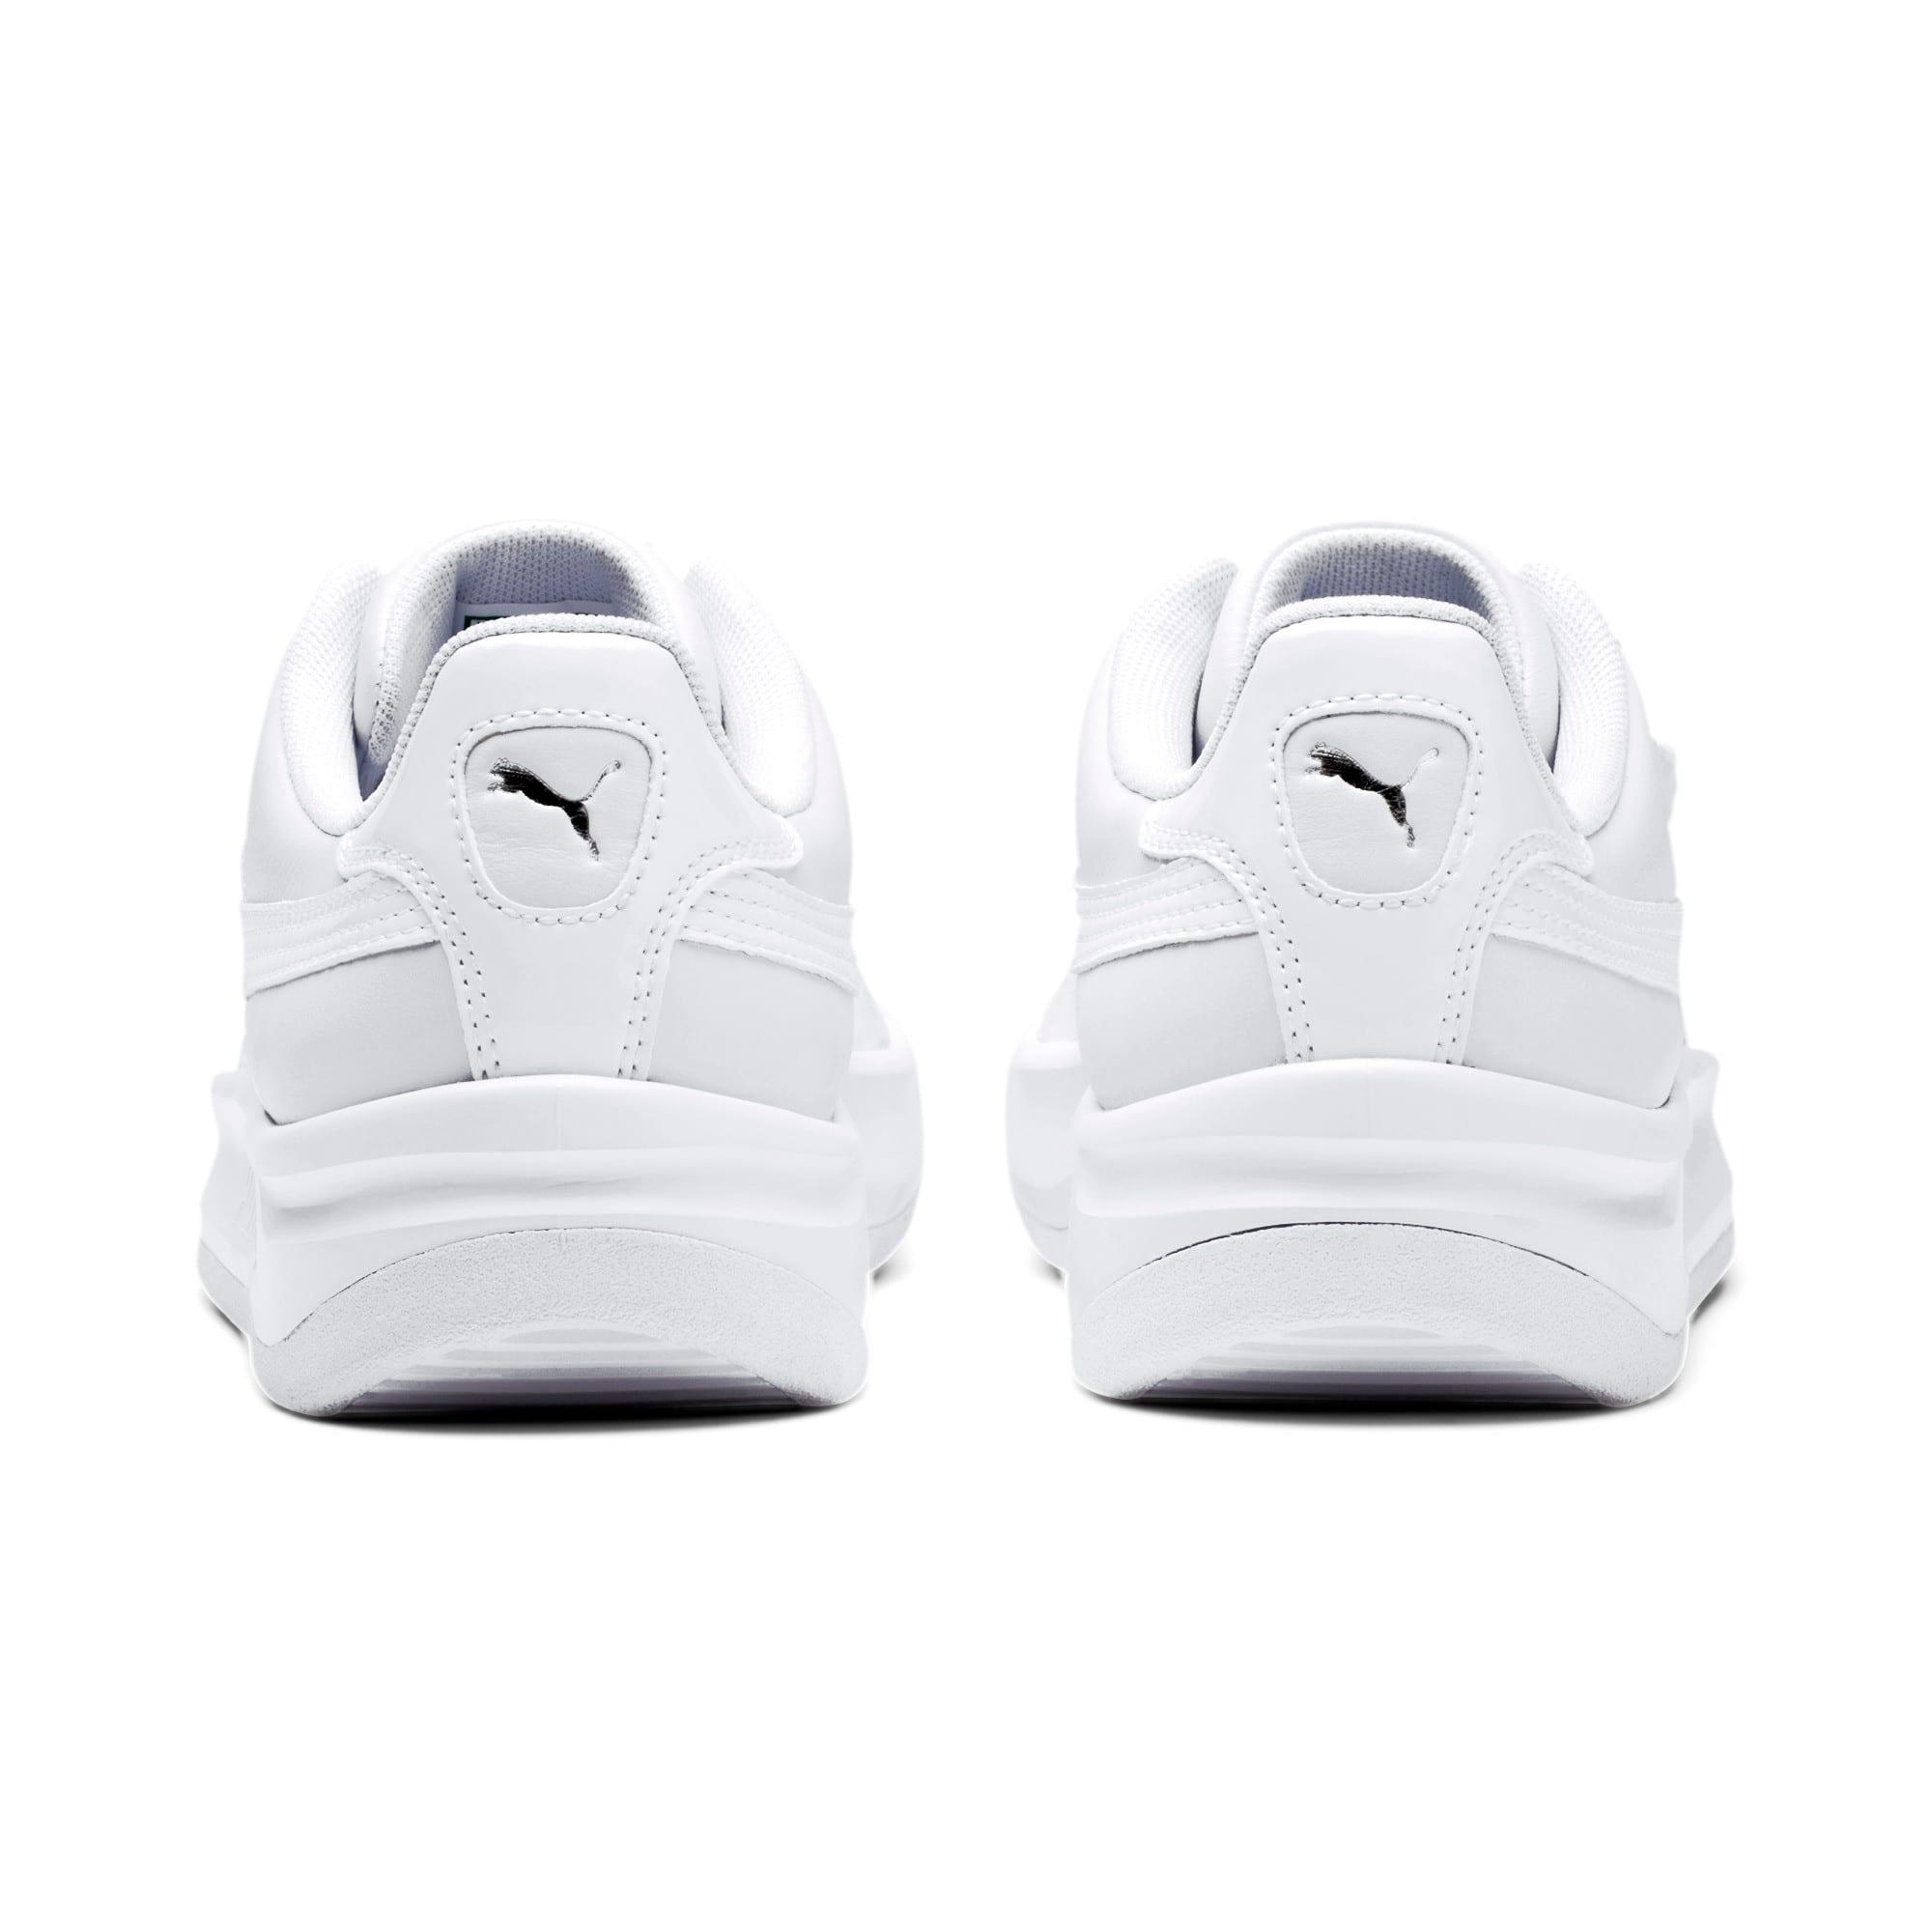 Thumbnail 4 of California Monochrome Women's Sneakers, Puma White-Puma Silver, medium